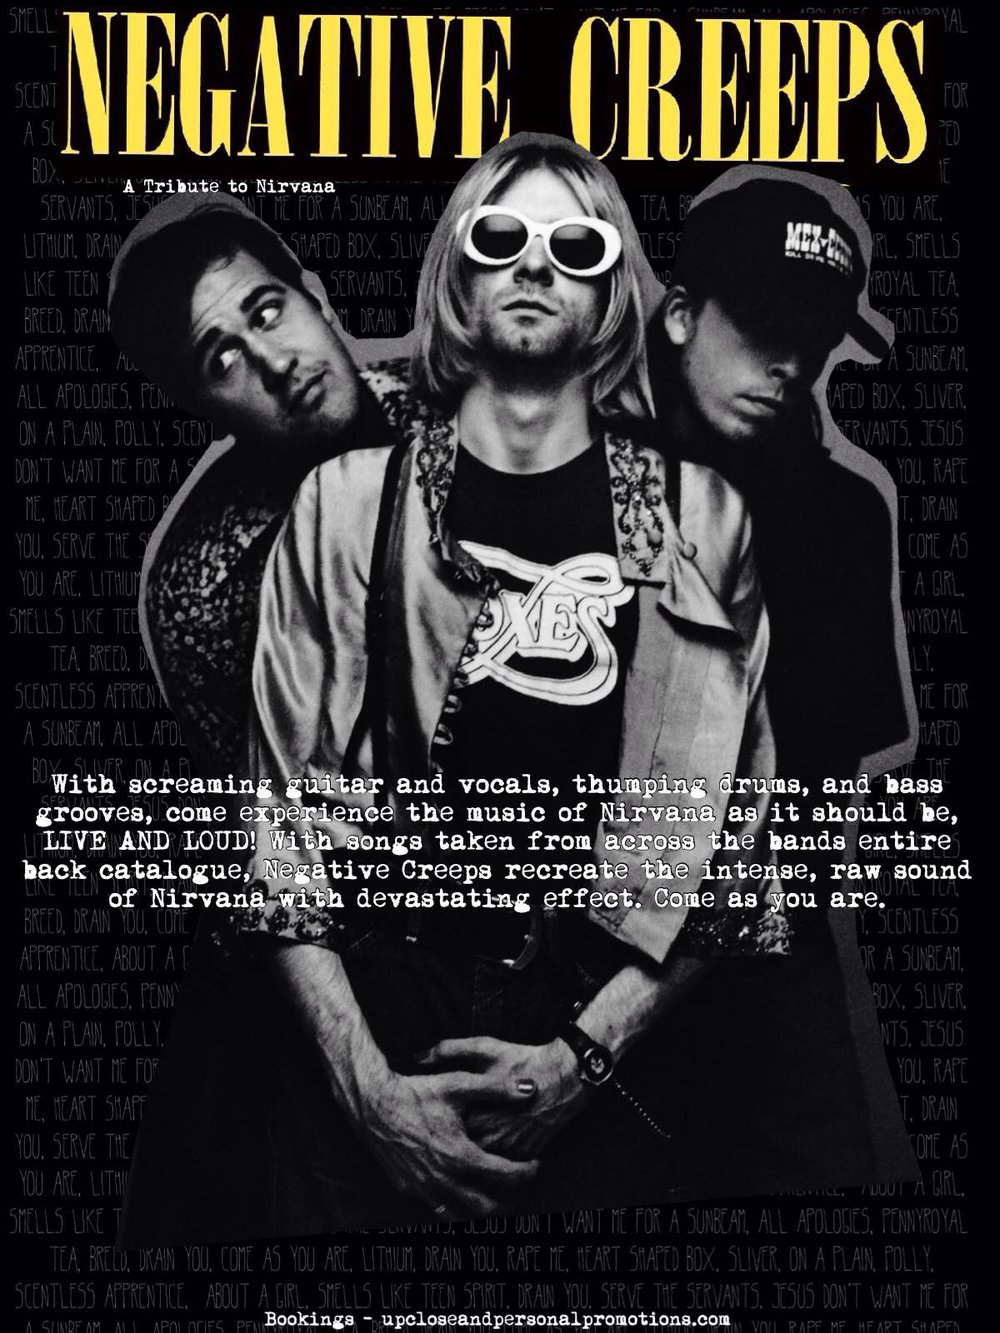 Negitive Creeps - A Tribute to Kurt Cobain & Nirvana